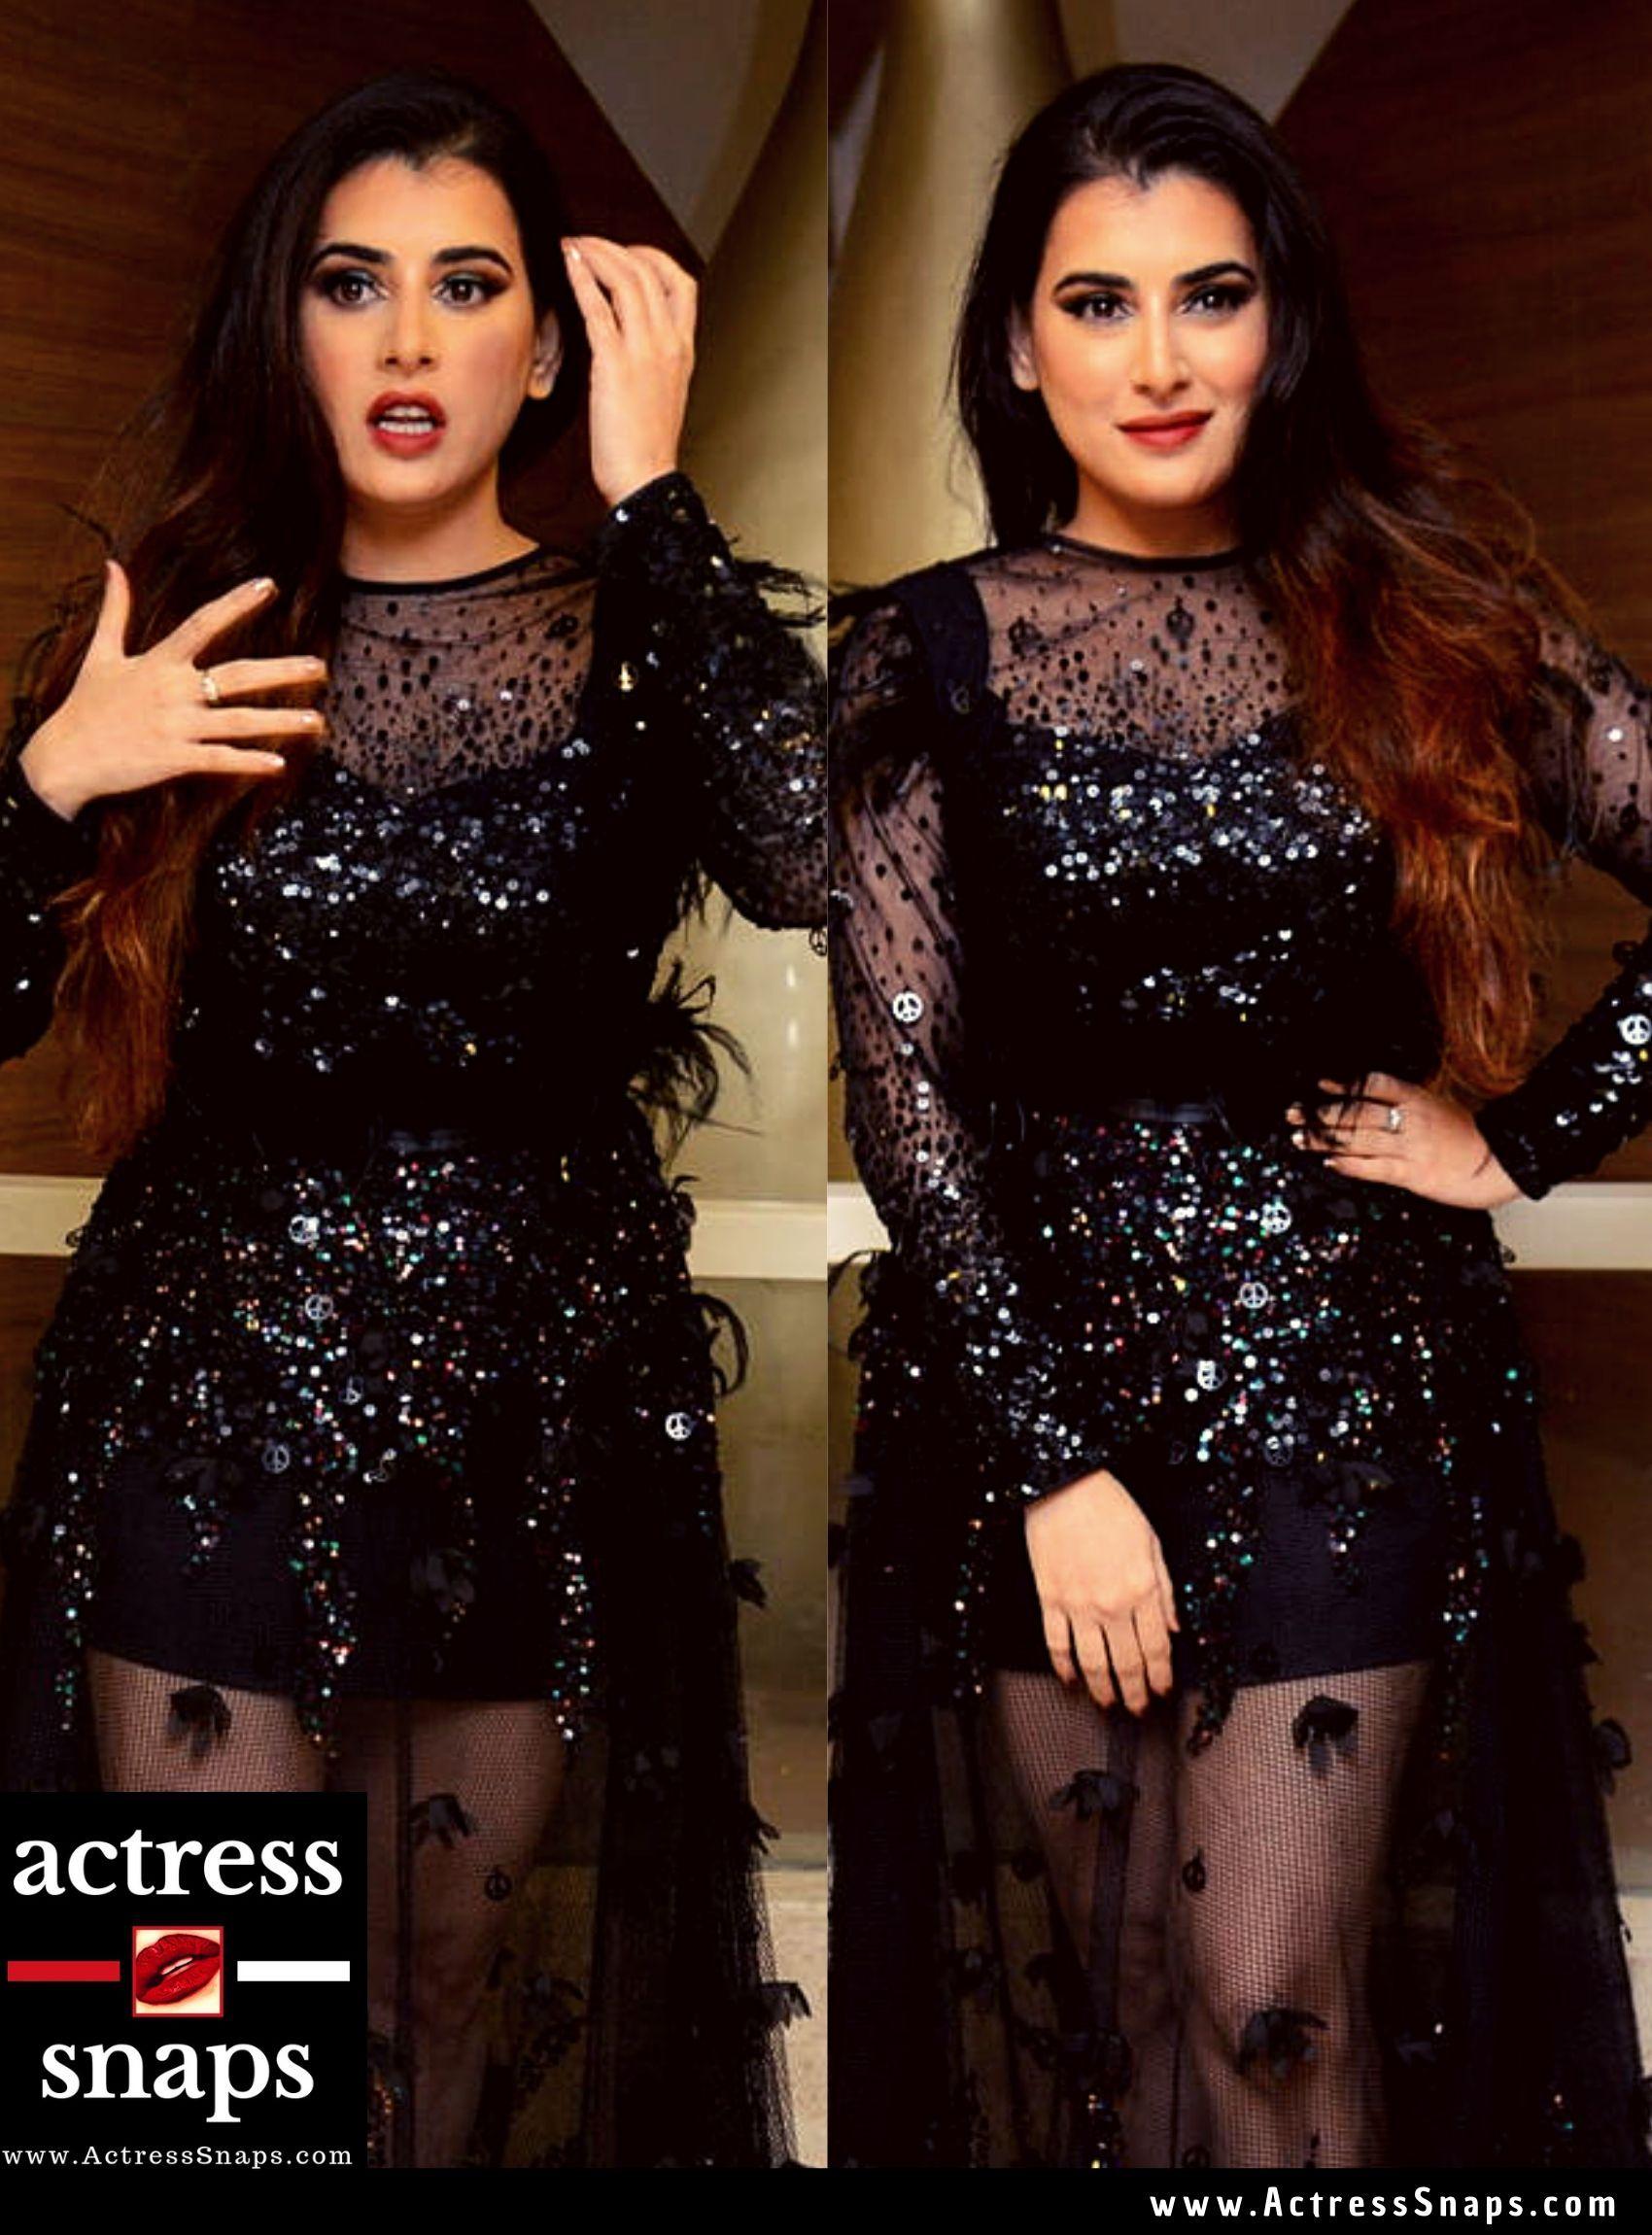 Veda /Archana Sastry - Sexy in Black Dress - Sexy Actress Pictures | Hot Actress Pictures - ActressSnaps.com